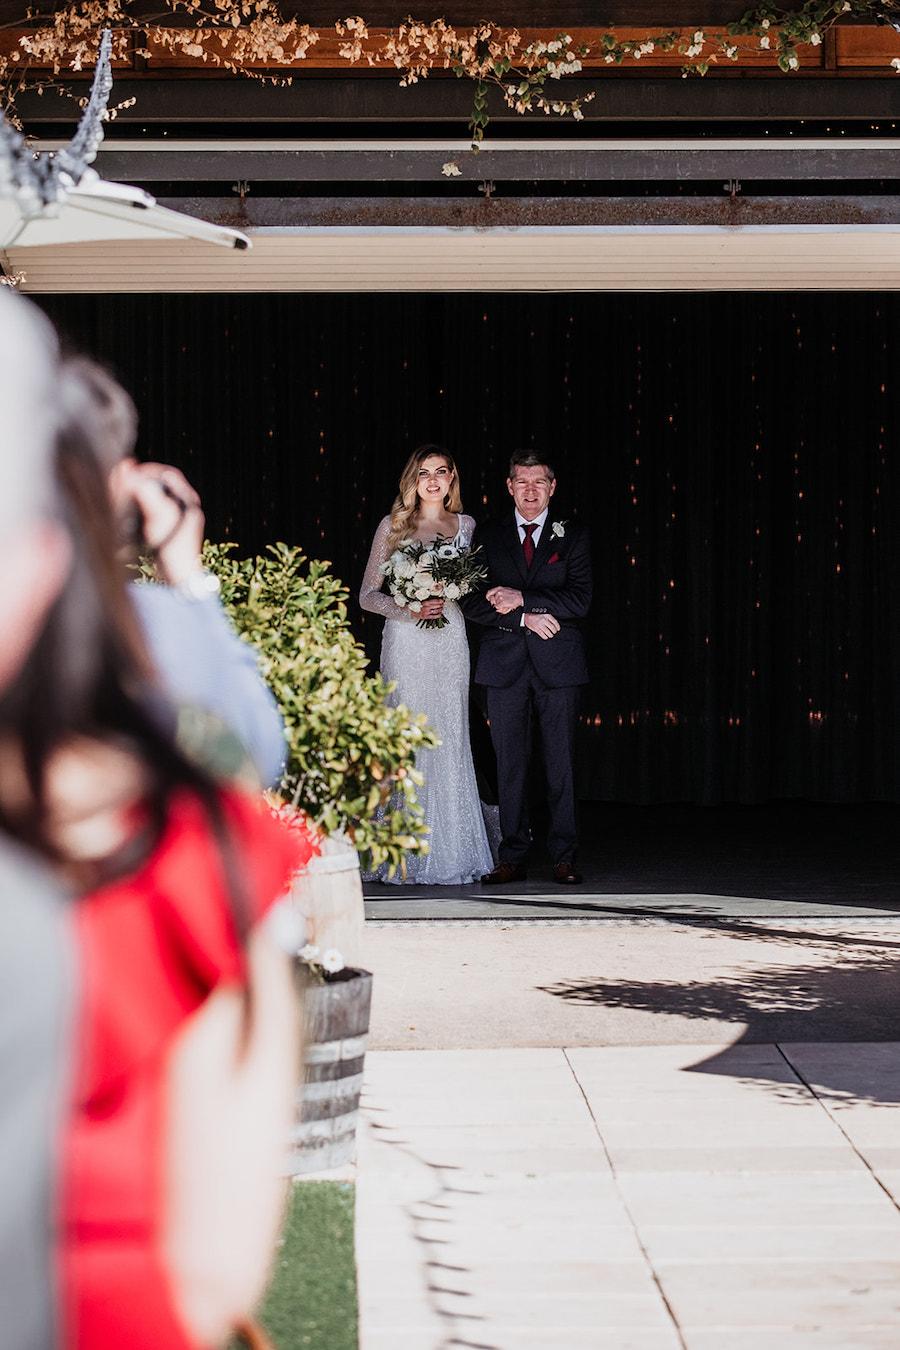 tweed-coast-weddings-wedding-venue-osteria-kelly-rohan-cloud-catcher-photography-Web_RK238.jpg